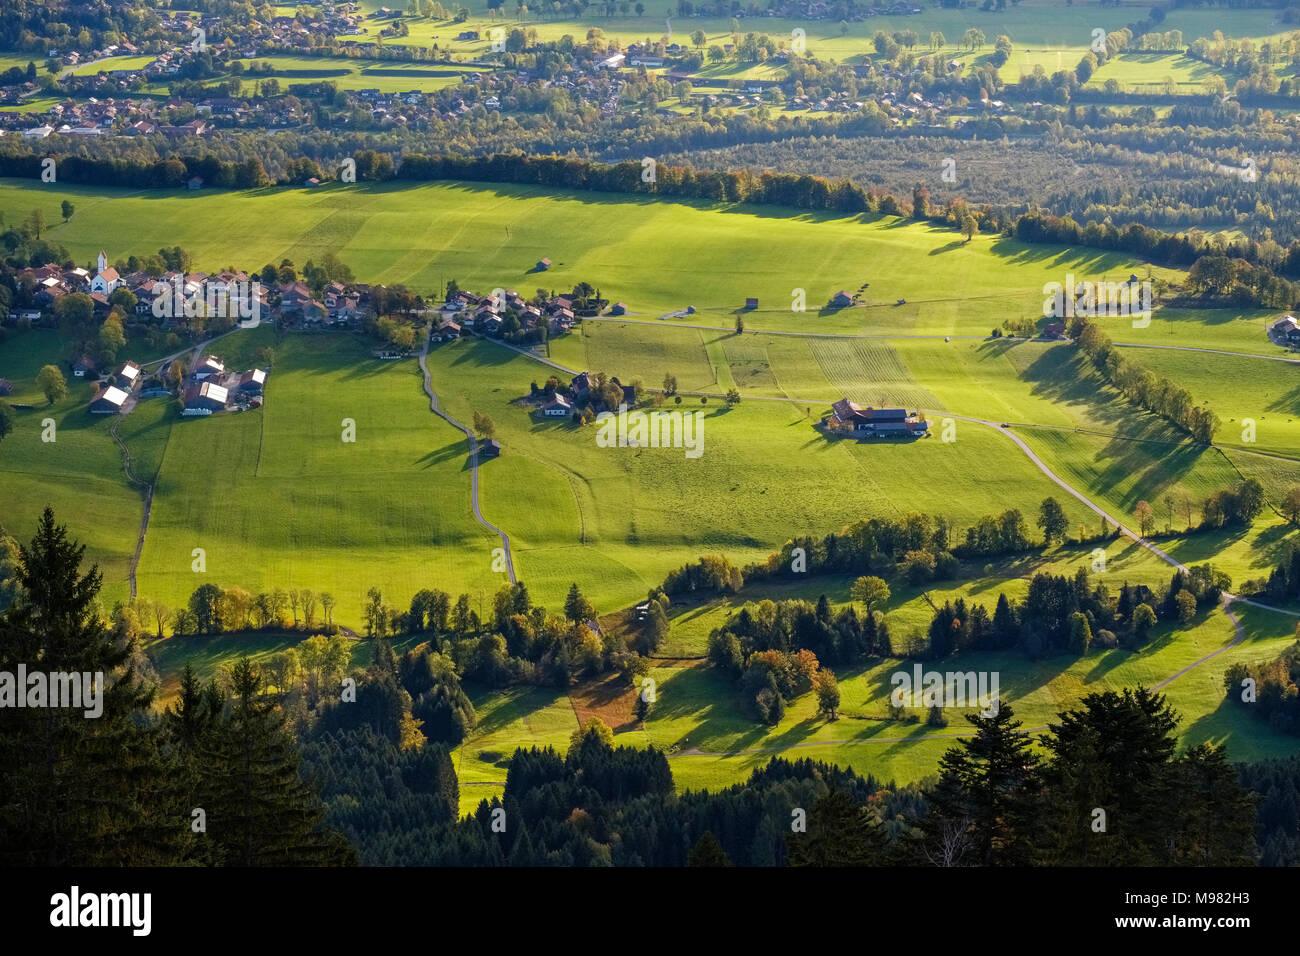 Wackersberg, Ausblick vom Blomberg, Isarwinkel, Oberbayern, Bayern, Deutschland - Stock Image